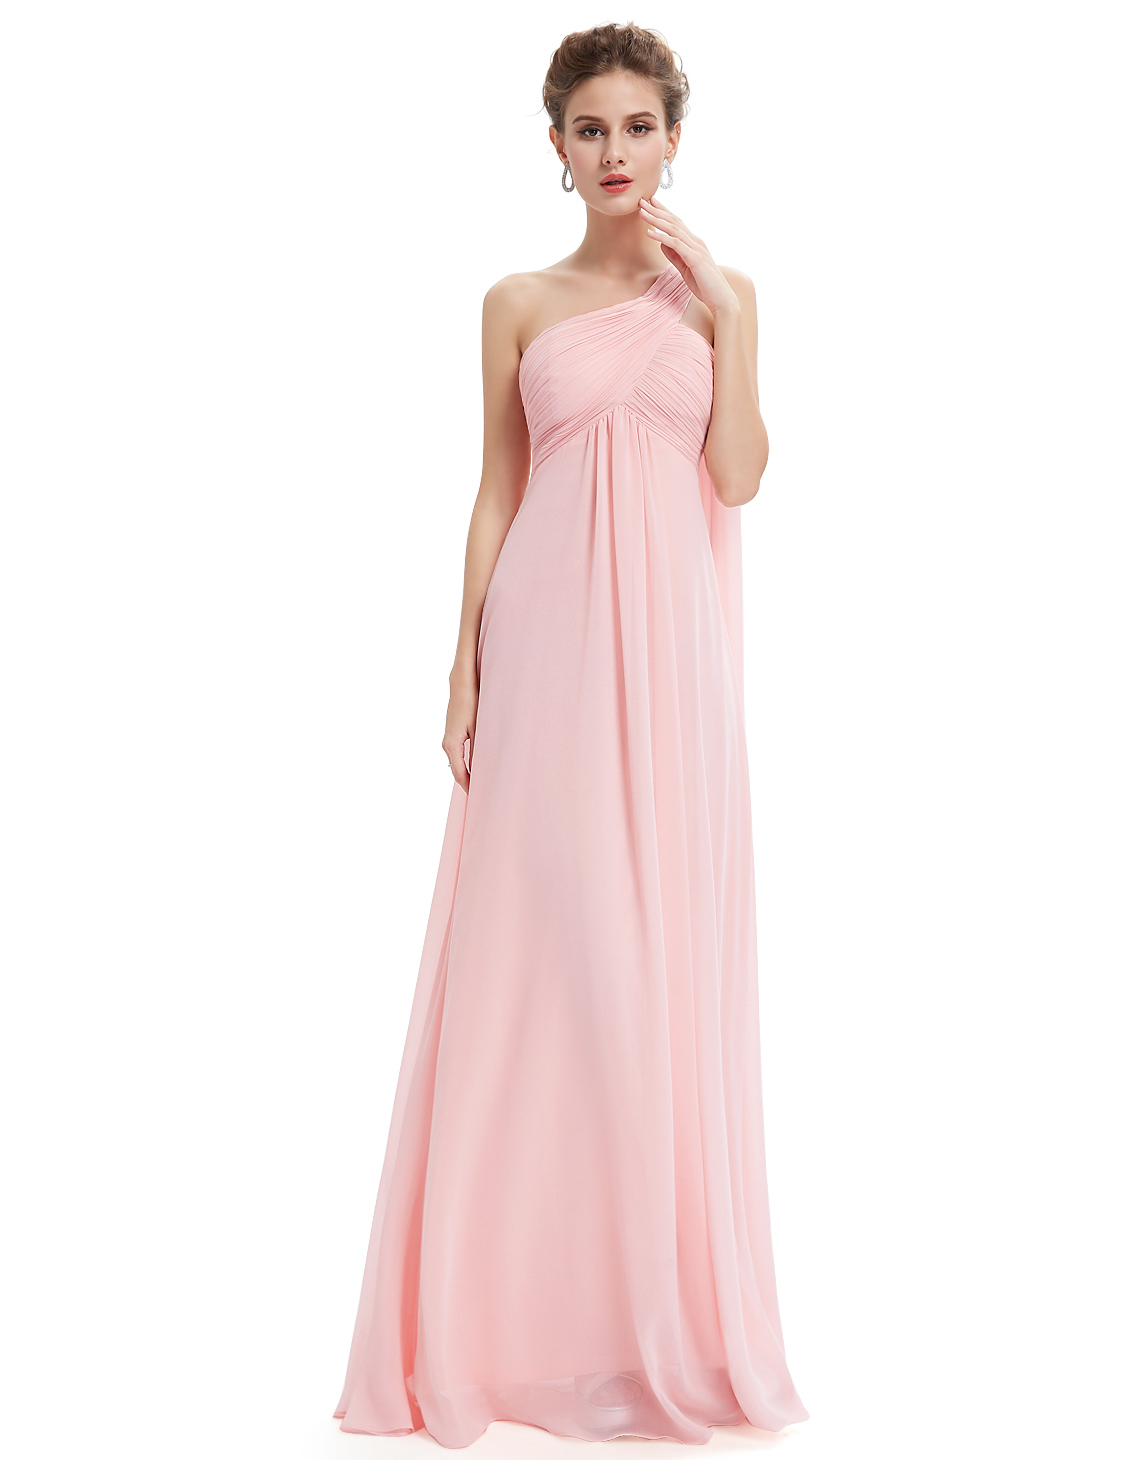 Ever-Pretty-Bridesmaid-Dresses-Chiffon-Ribbon-Long-Formal-Cocktail-Party-Dress thumbnail 22